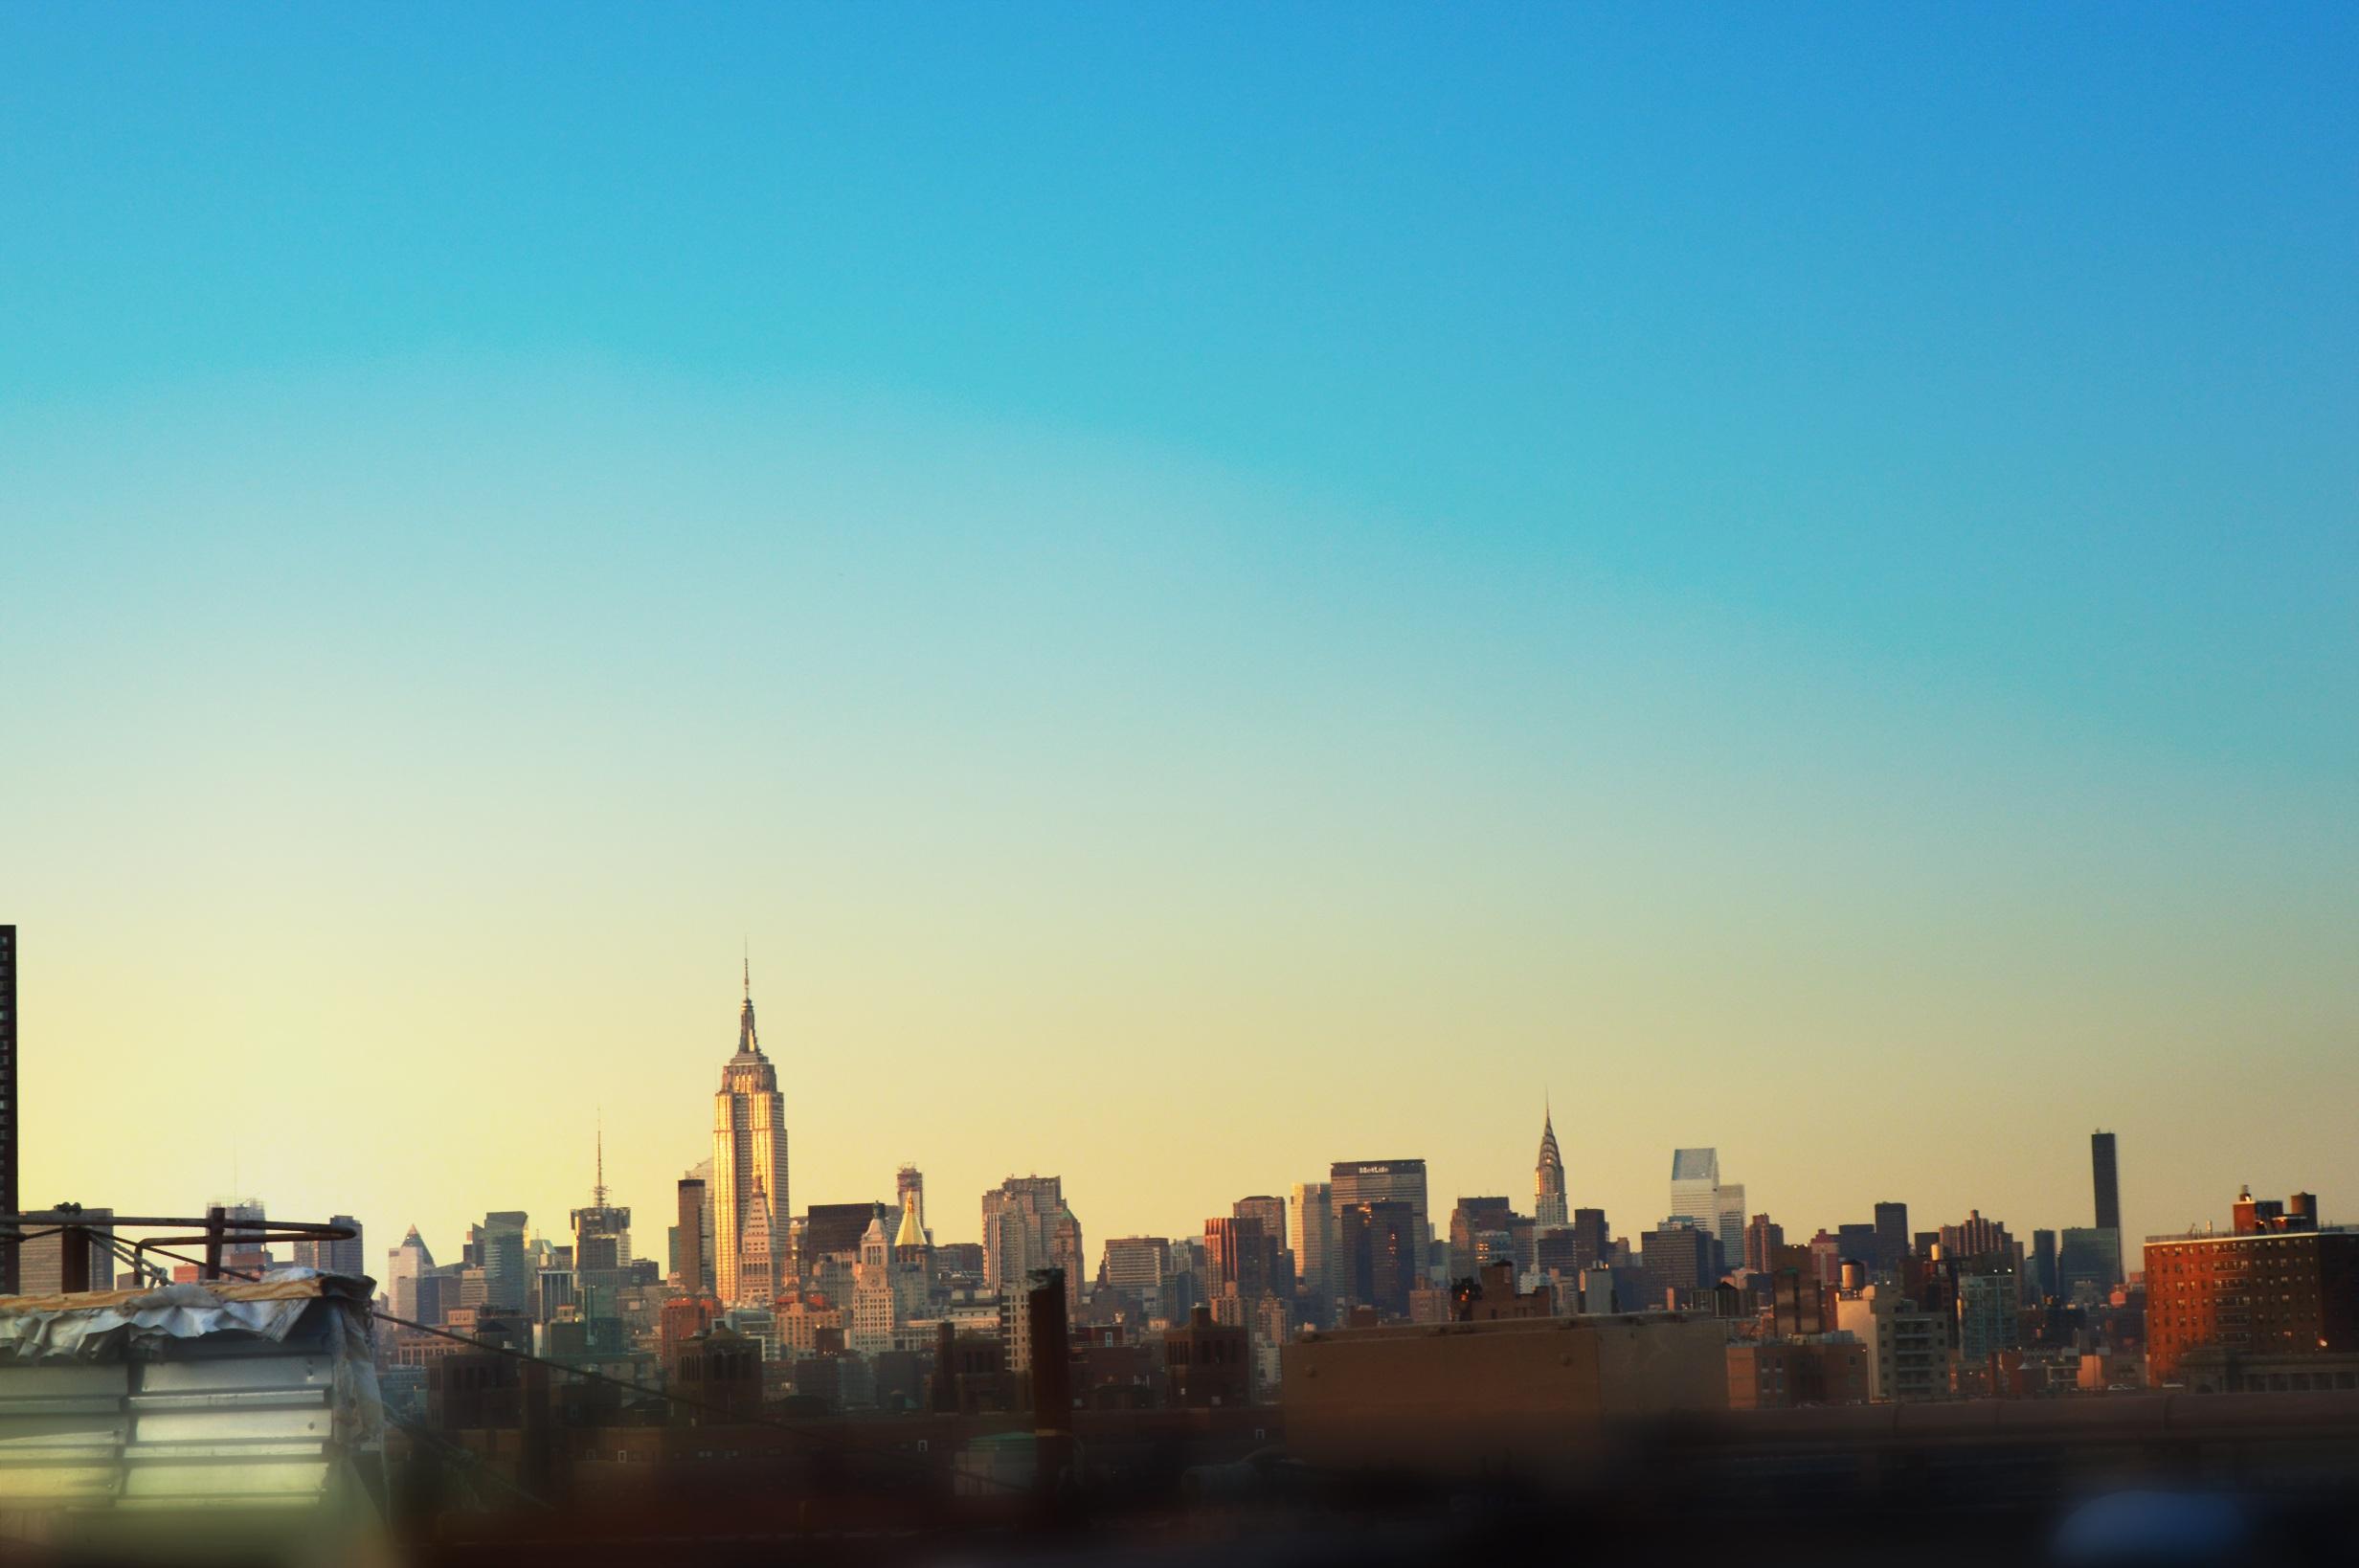 Free Images : Sky, Sunset, Bridge, Skyline, Morning, Dawn